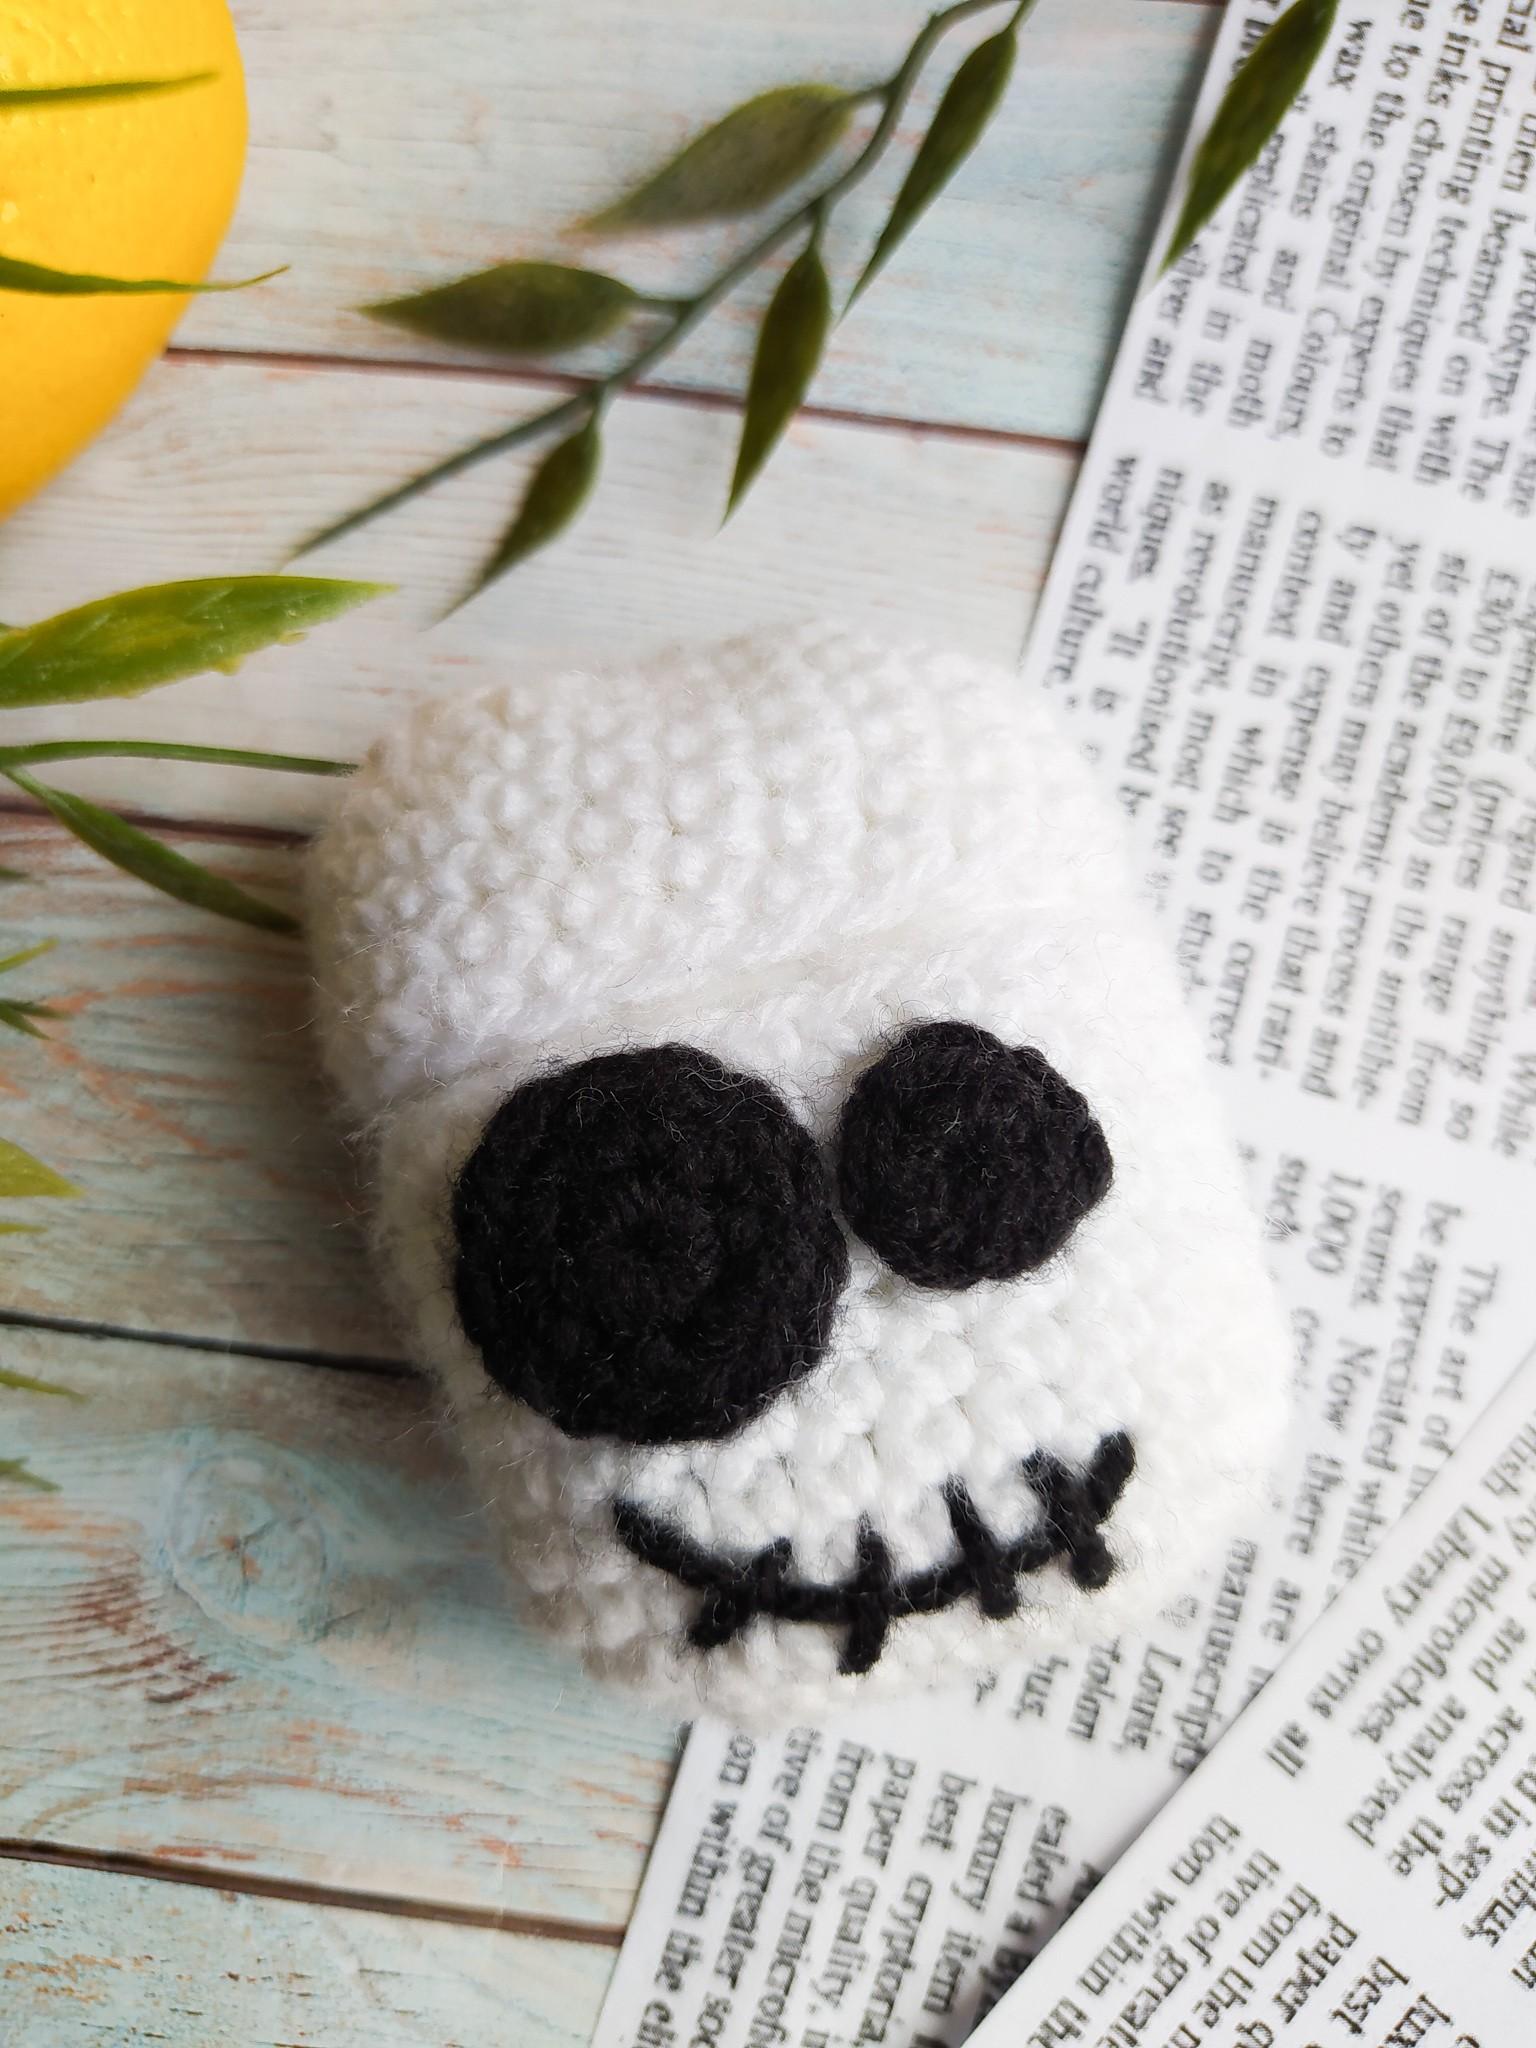 Amigurumi Jack Skellington Crochet Free Patterns [Video] - Crochet ... | 2048x1536